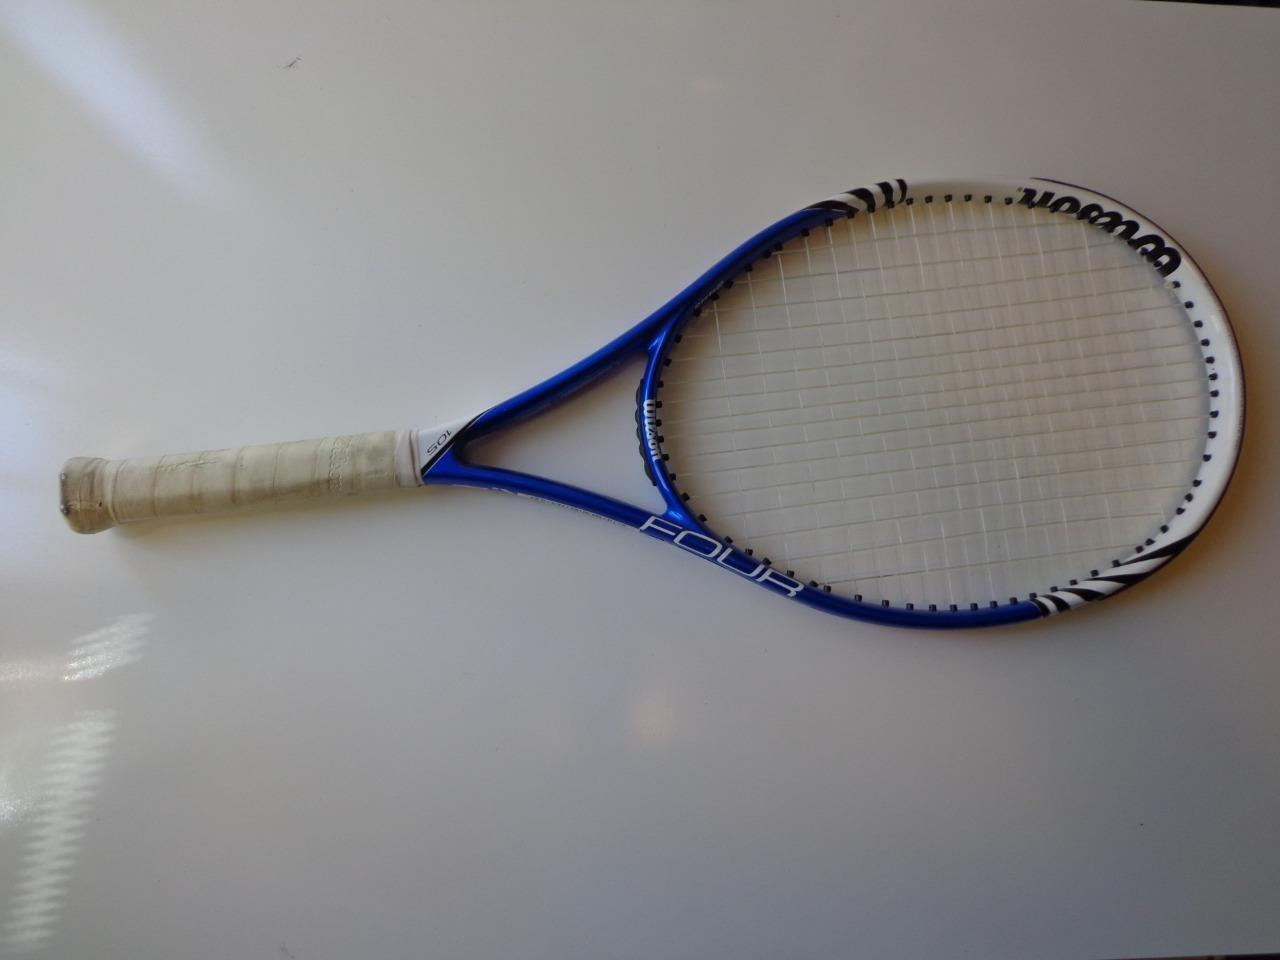 Wilson Blx 4 105 cabeza 4 1 4 Grip Tenis Raqueta